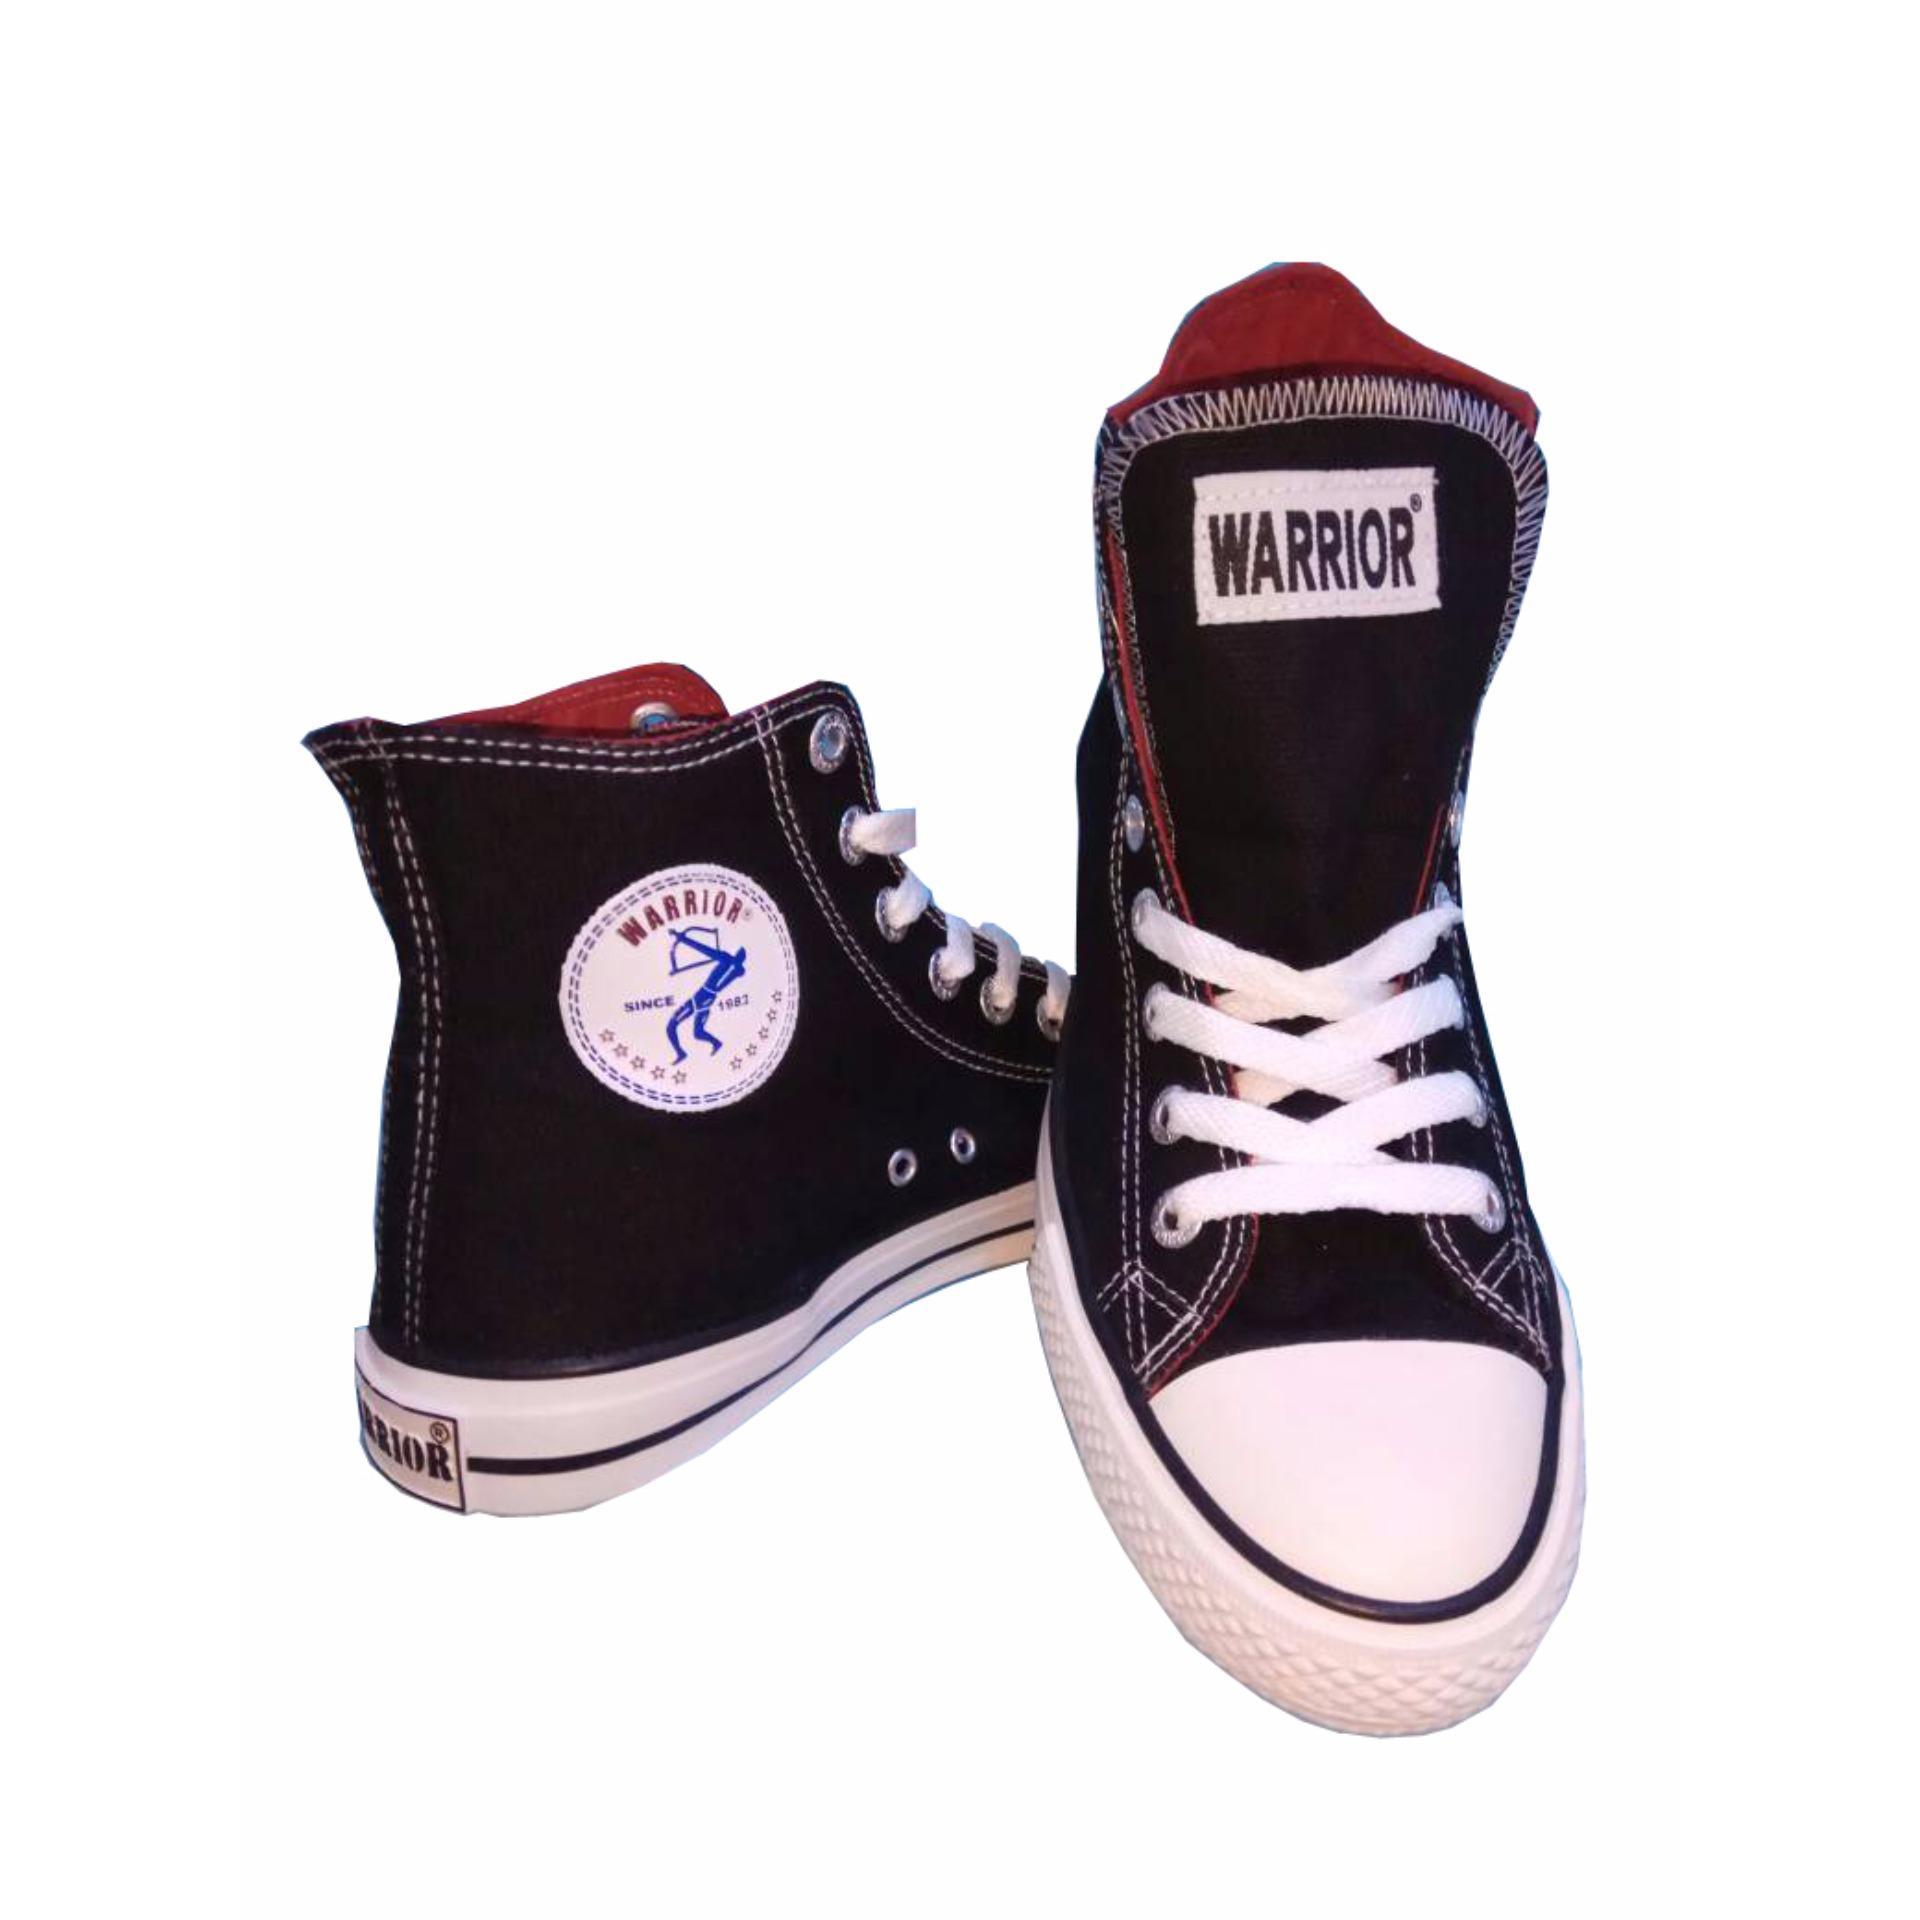 Permalink to Sepatu All Star Ulasan